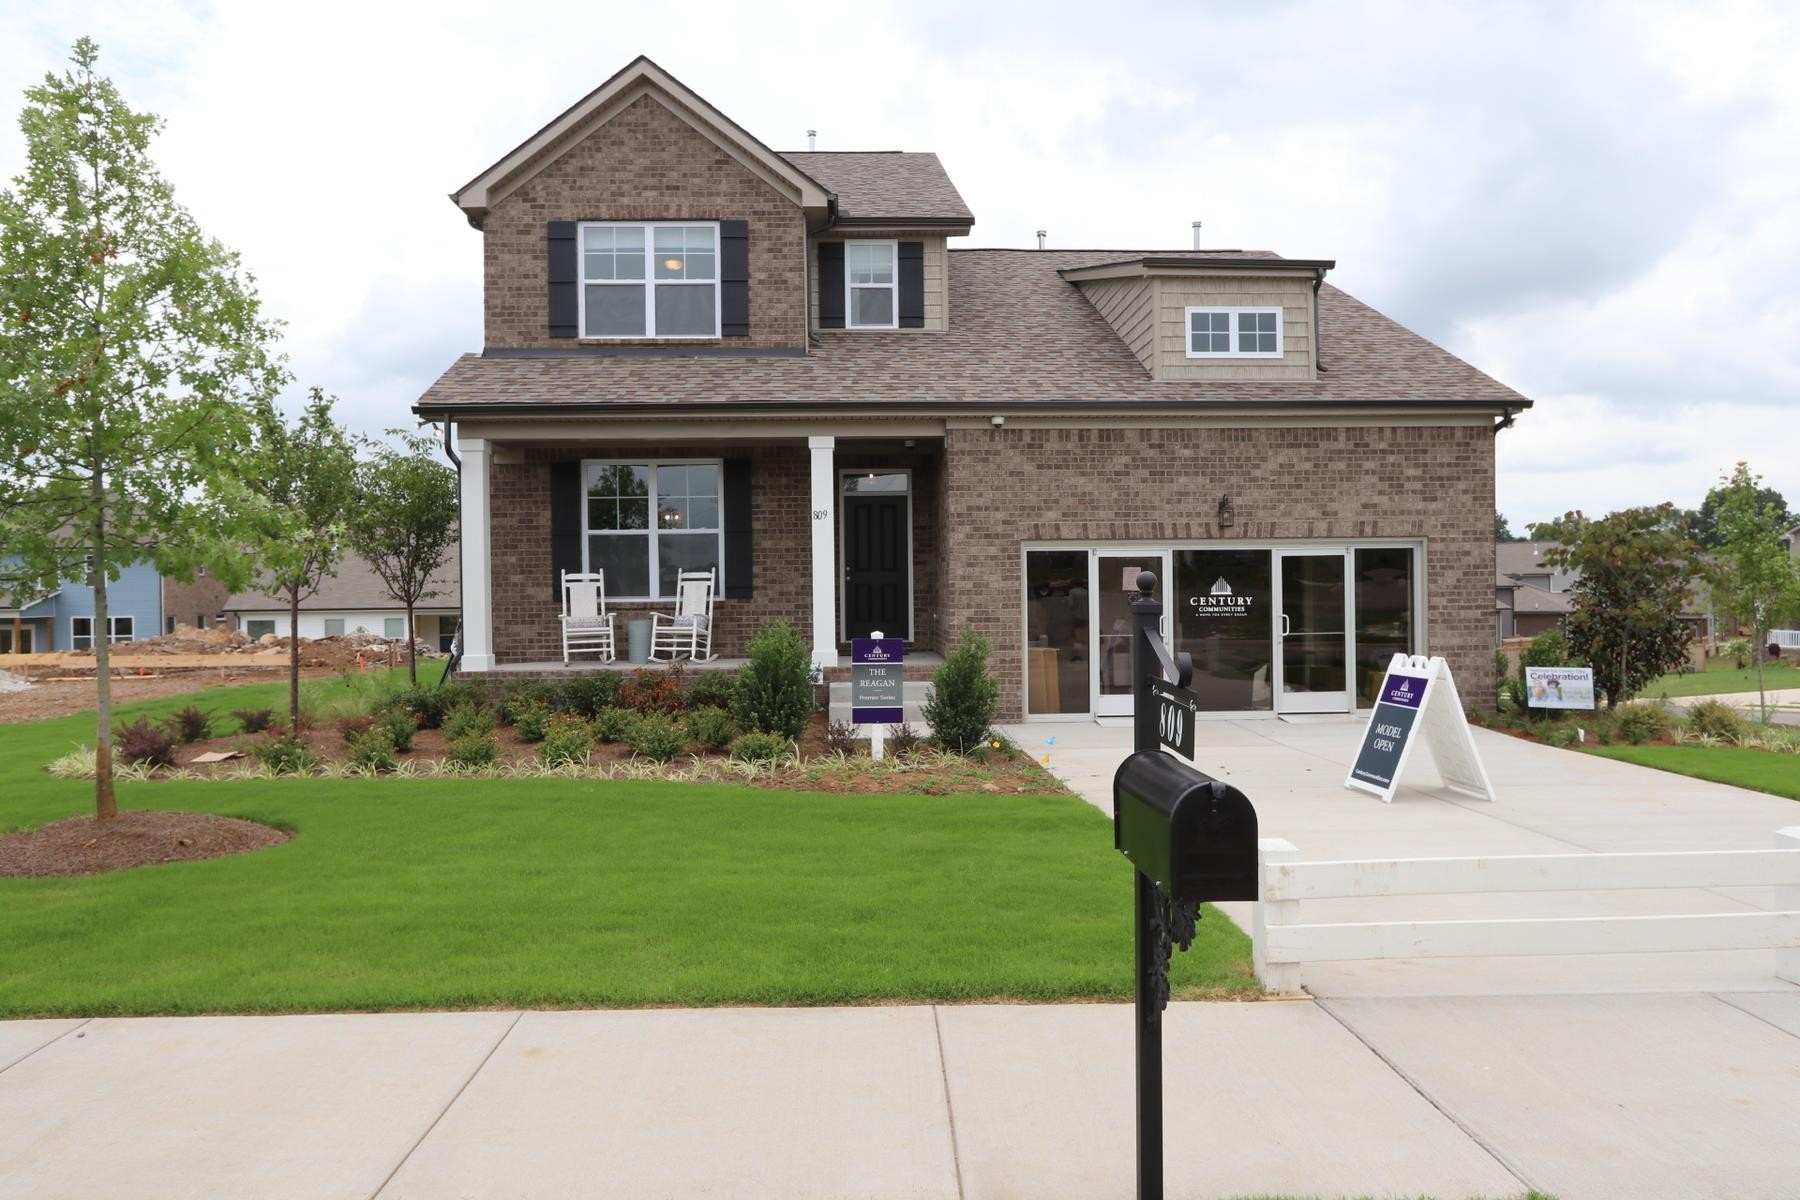 809 Amberton Dr Lot 25, Smyrna, TN 37167 - Smyrna, TN real estate listing